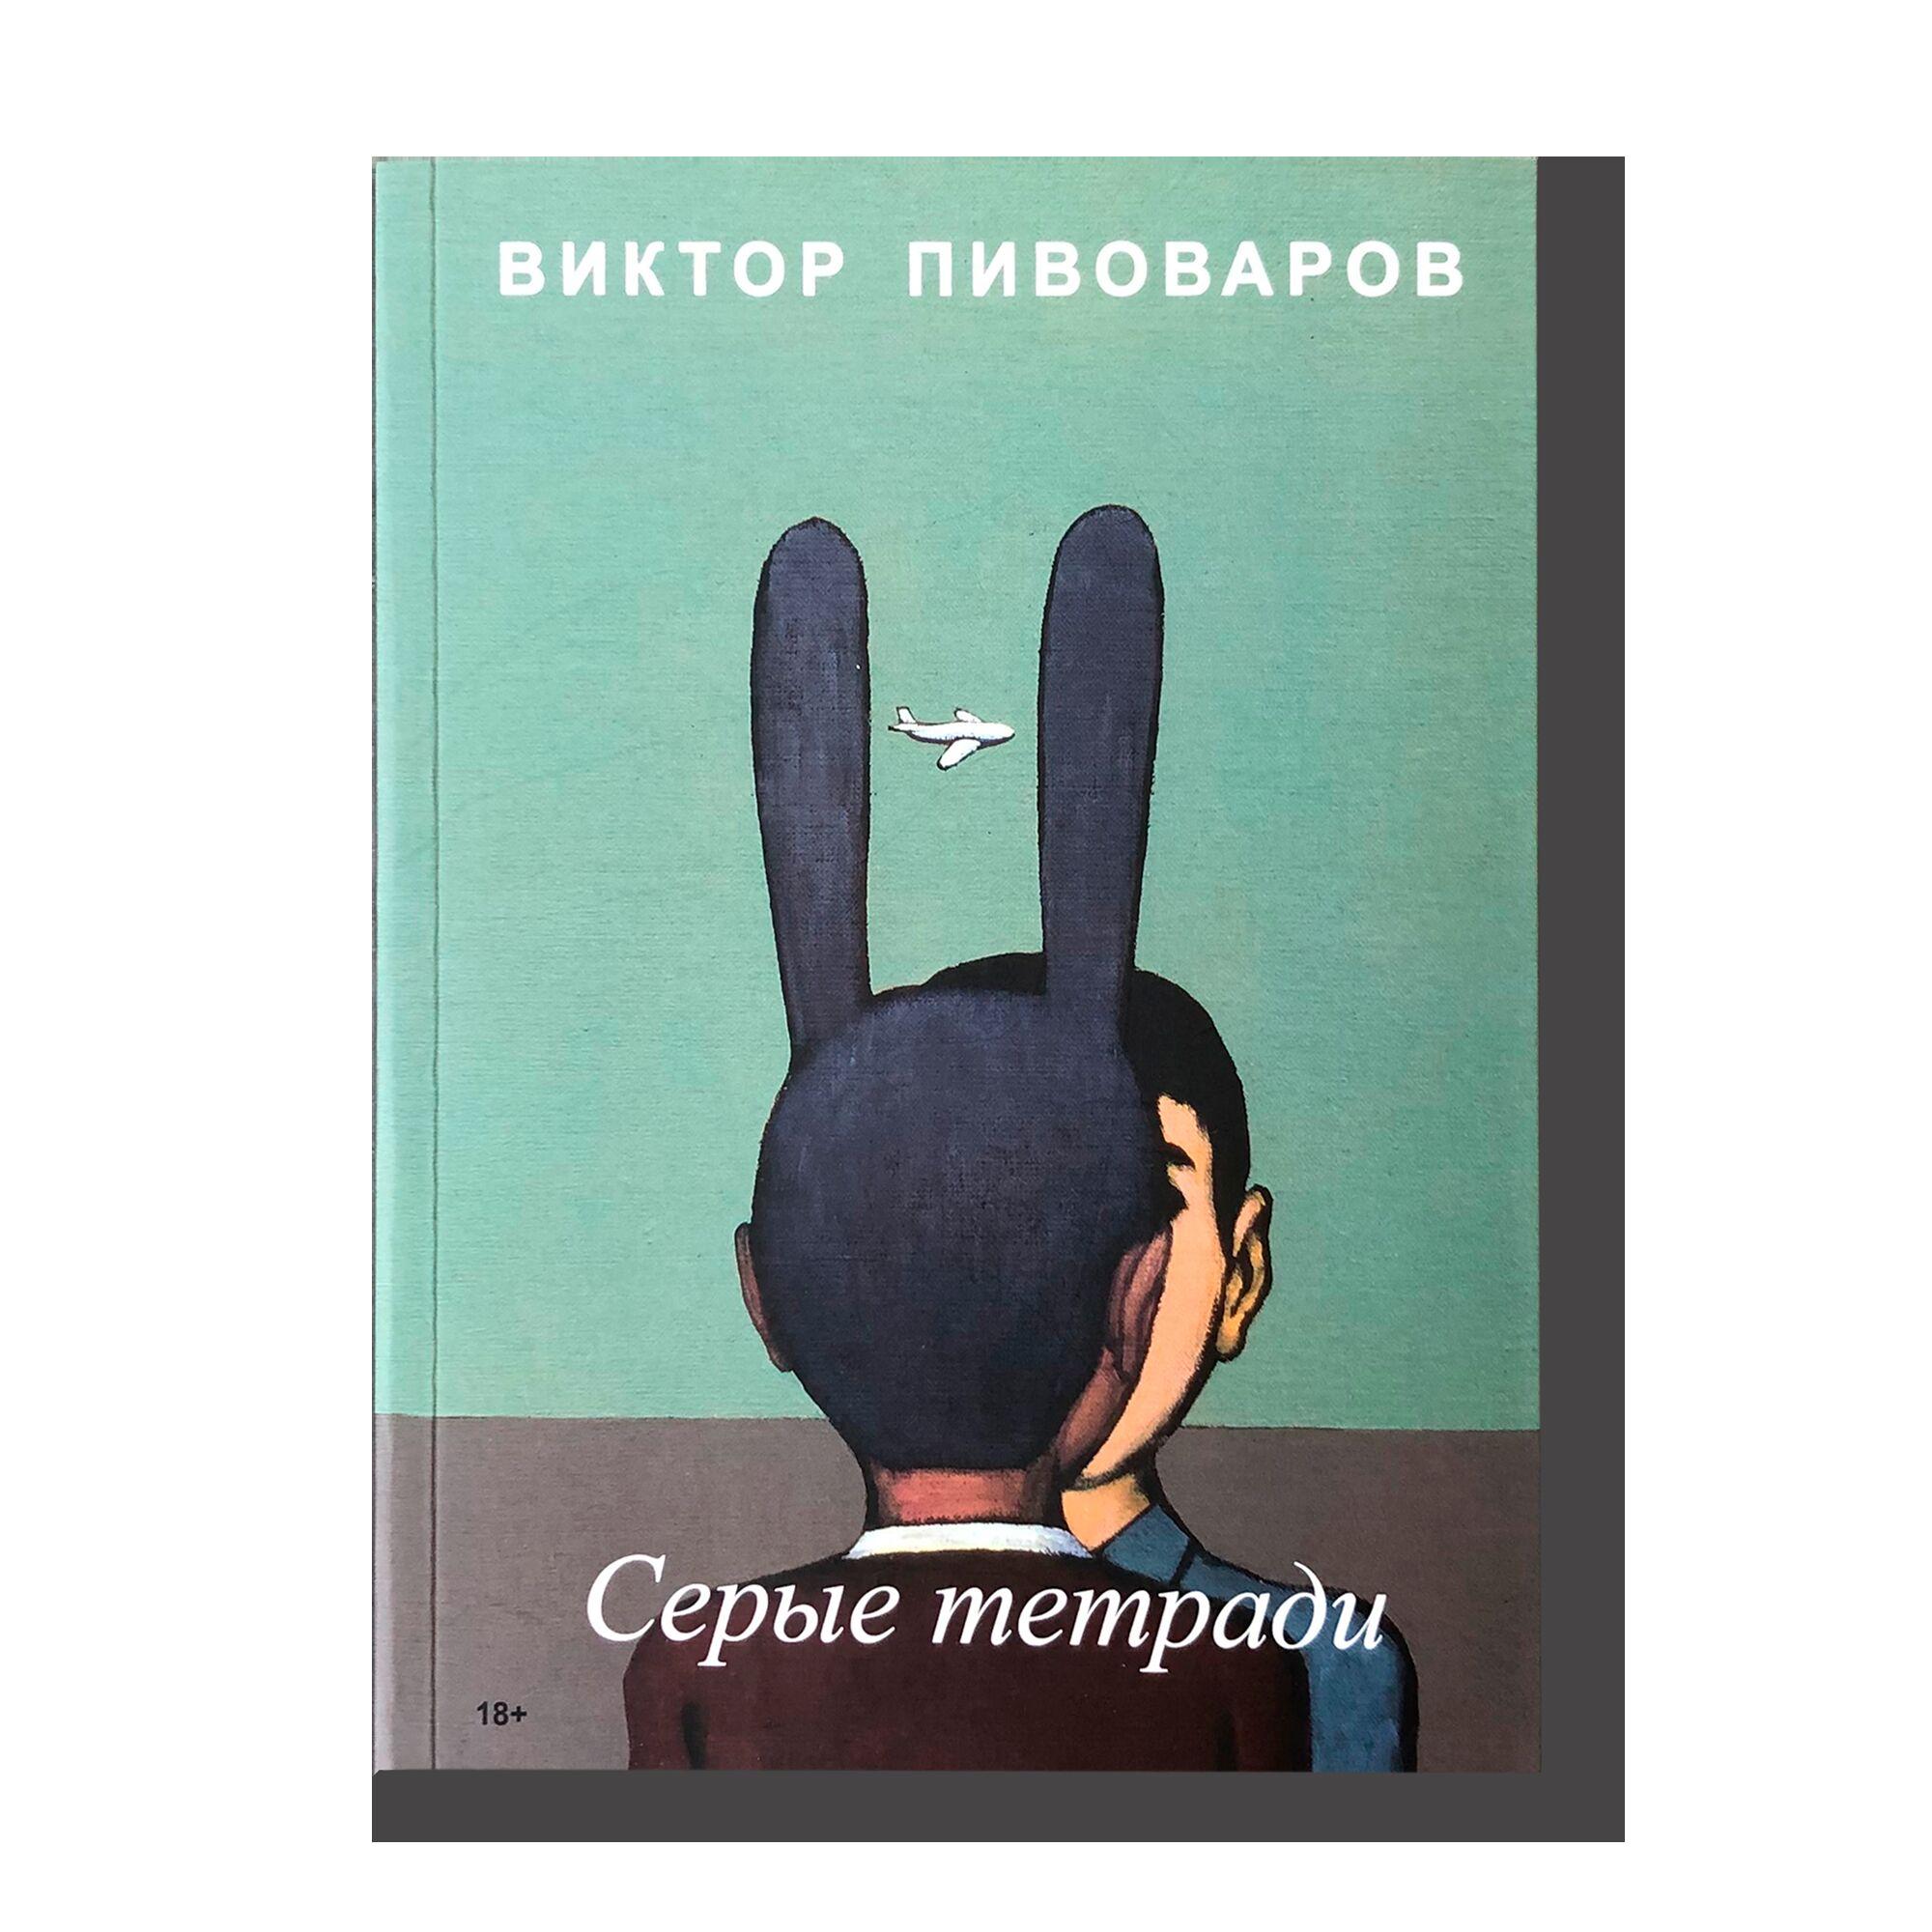 Gray Notebooks